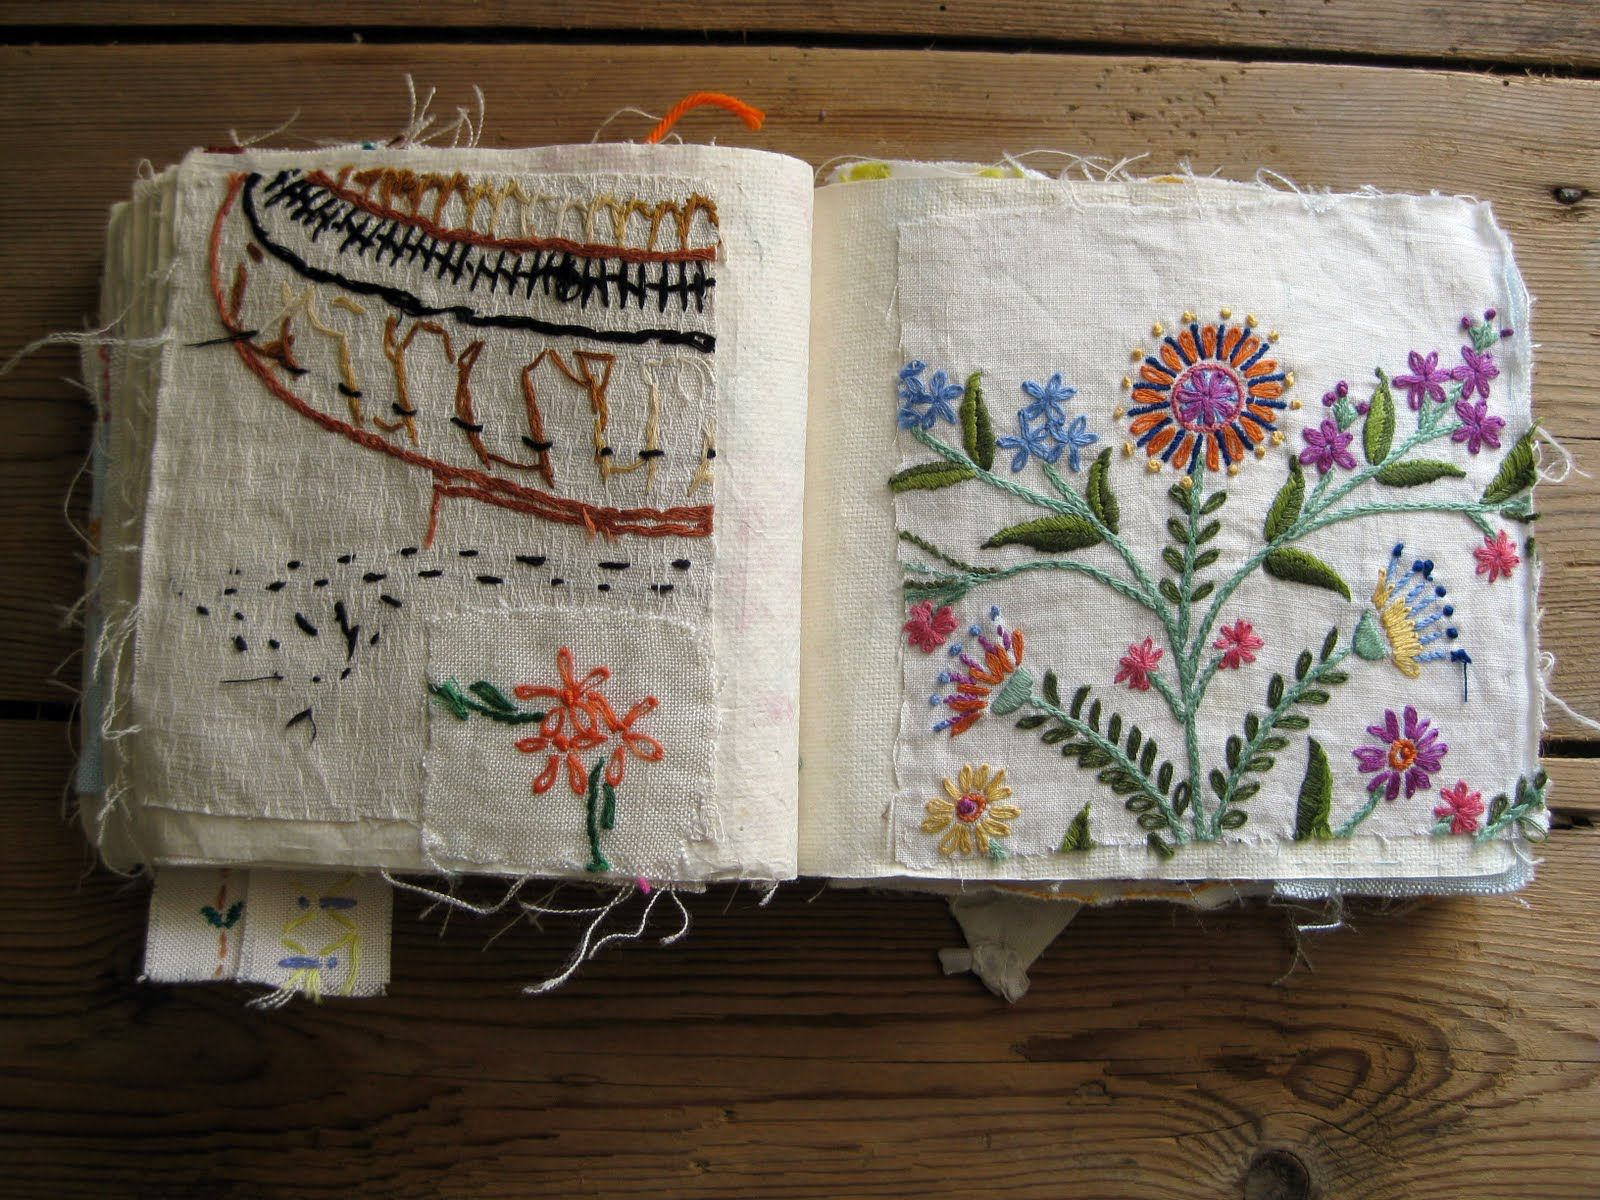 How To Make A Stitch Sampler Book